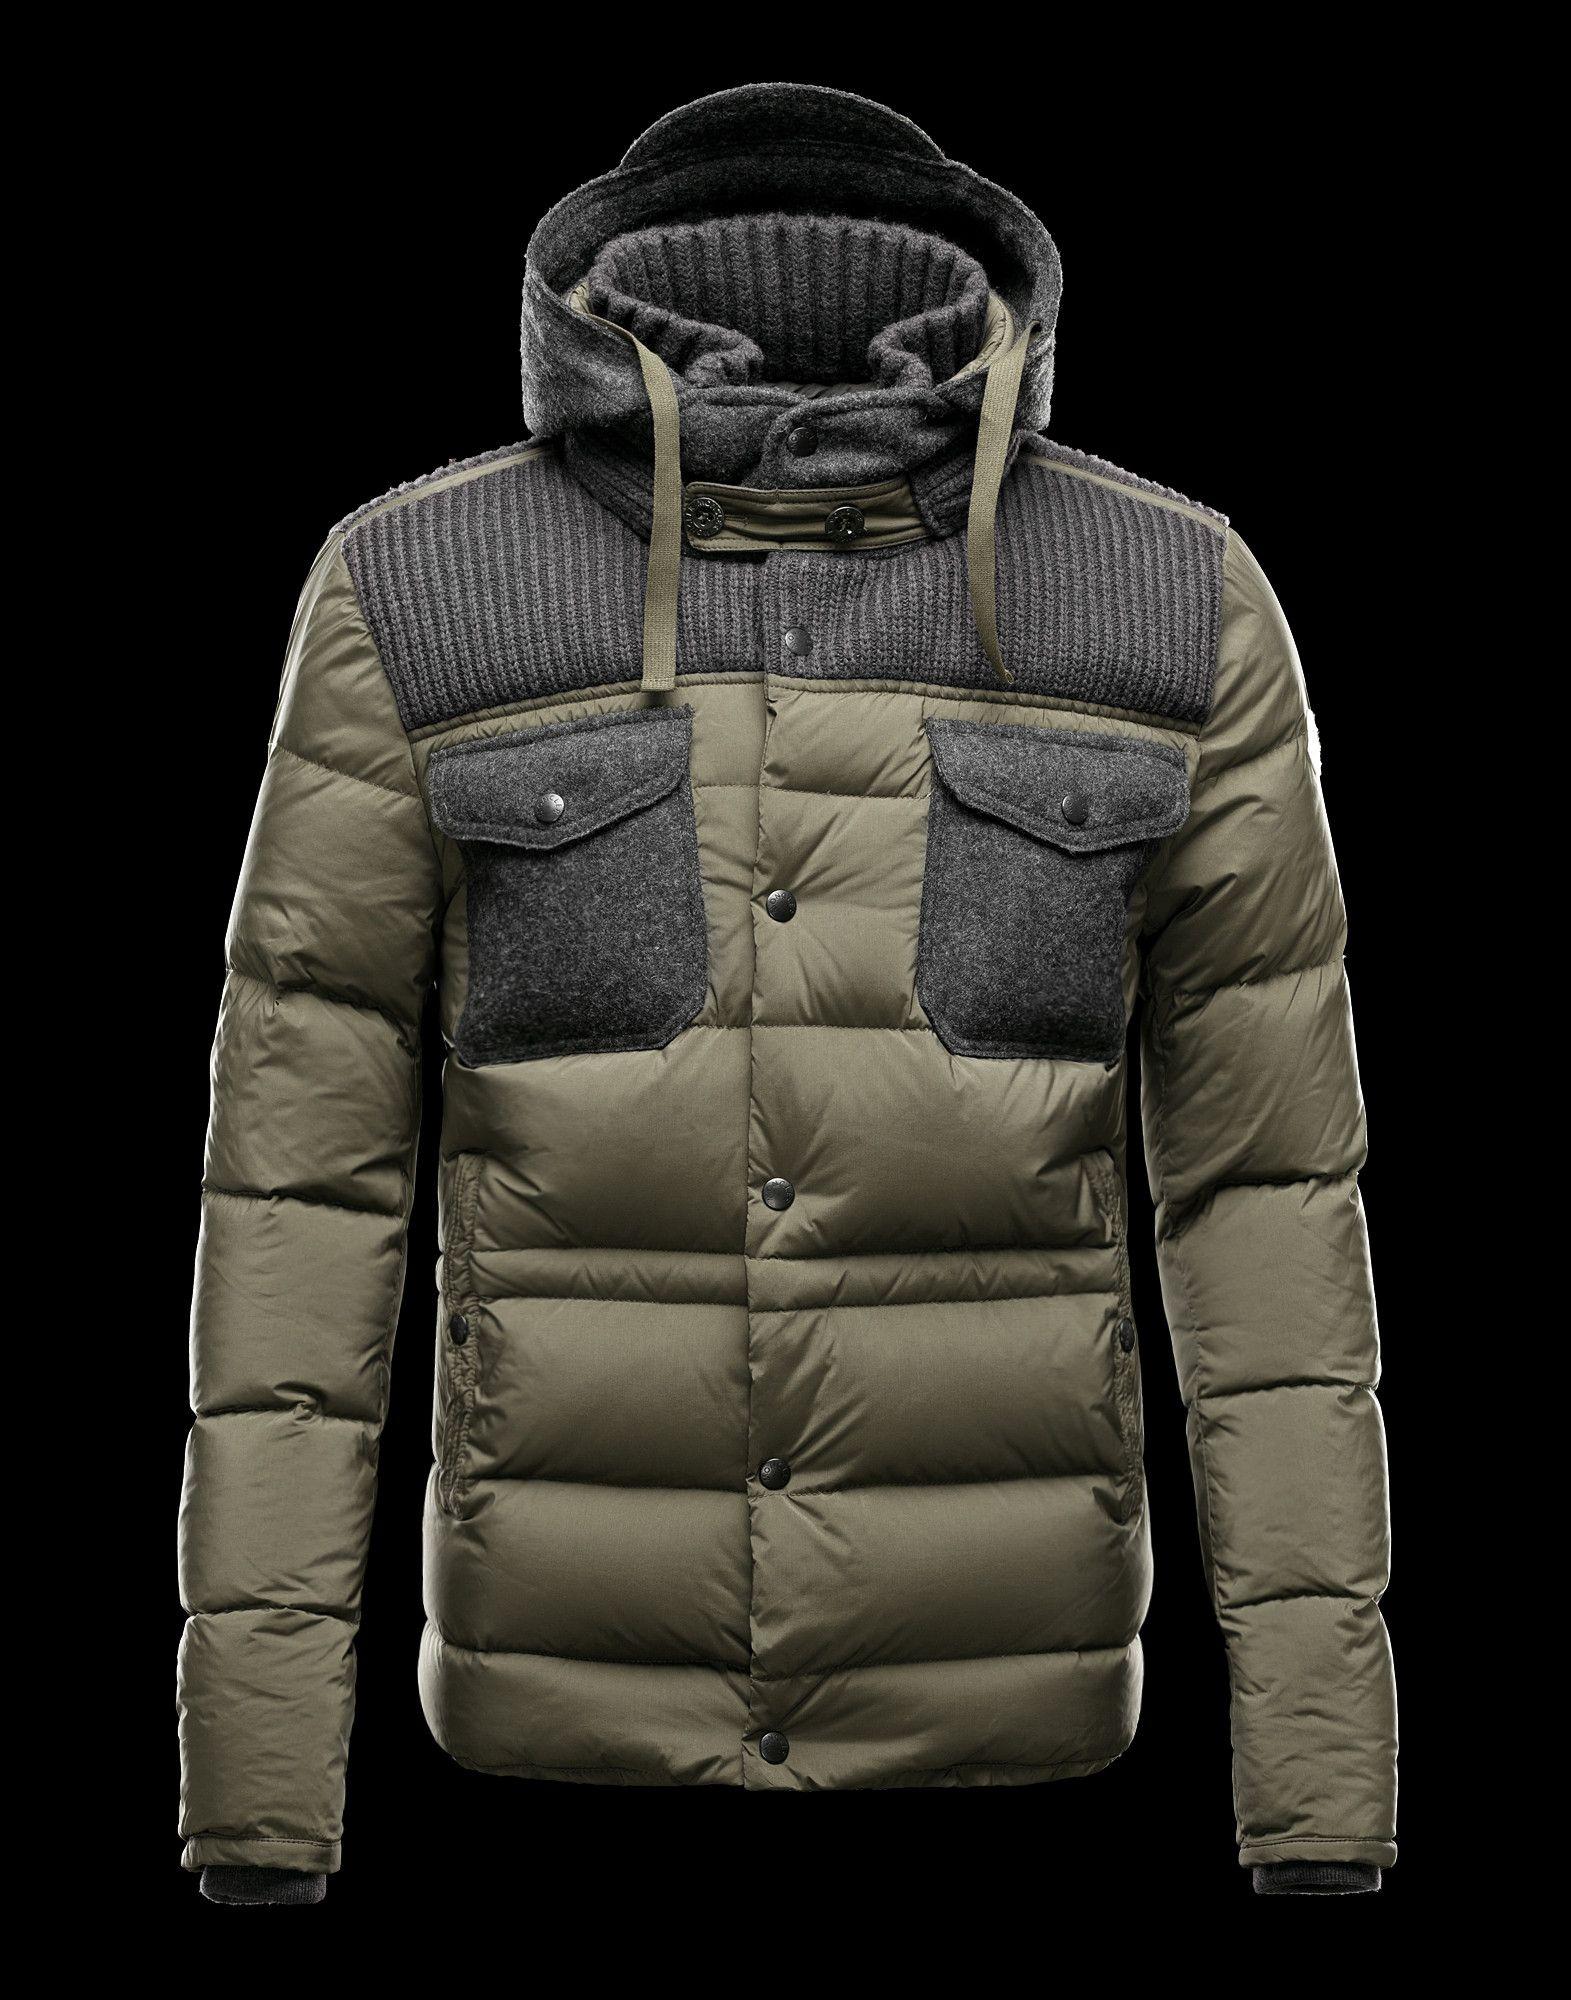 MONCLER Men Autumn/Winter 12 OUTERWEAR Jacket